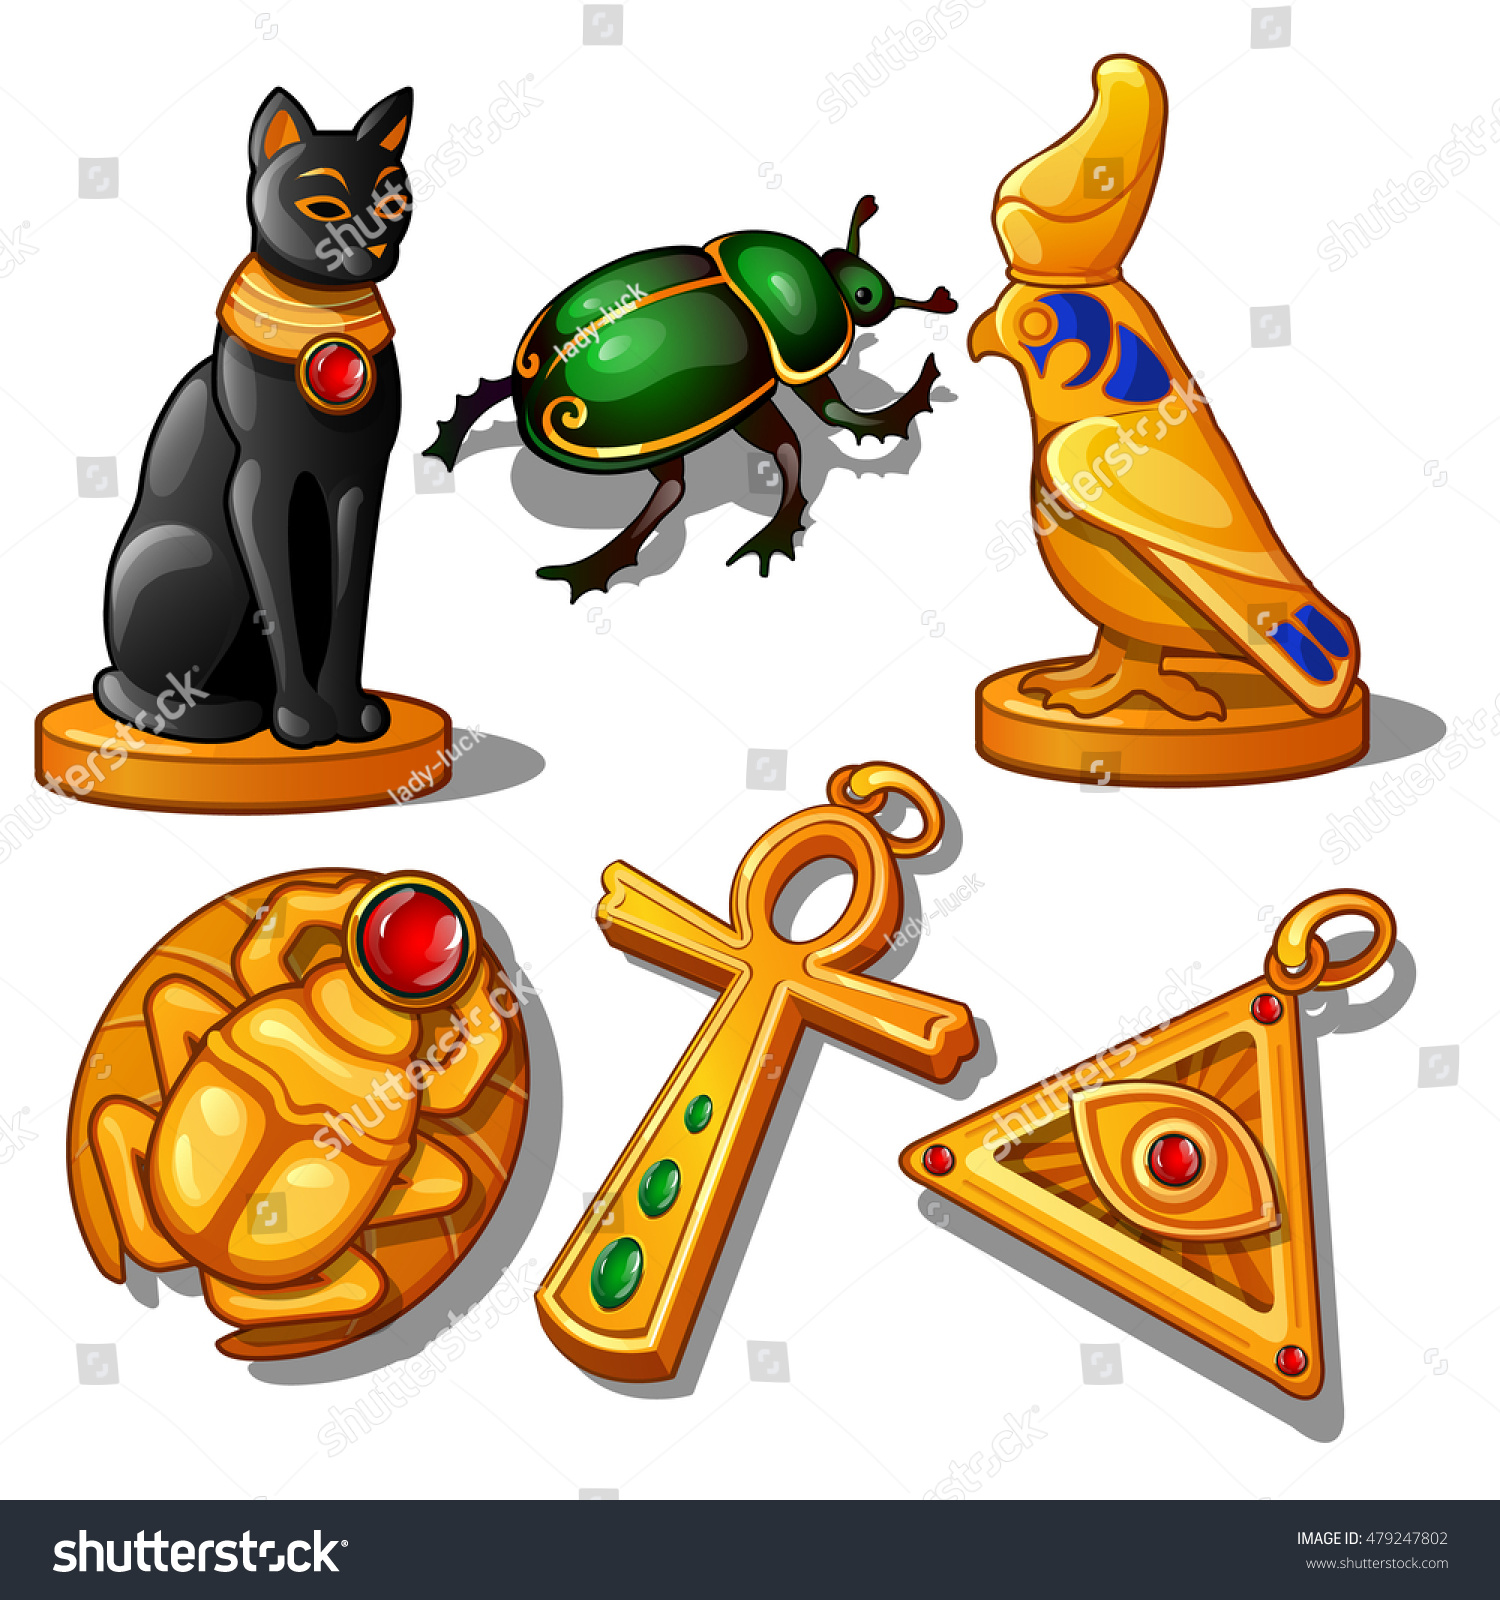 Ancient Figurines Animals Religious Symbols Made Stock Vector